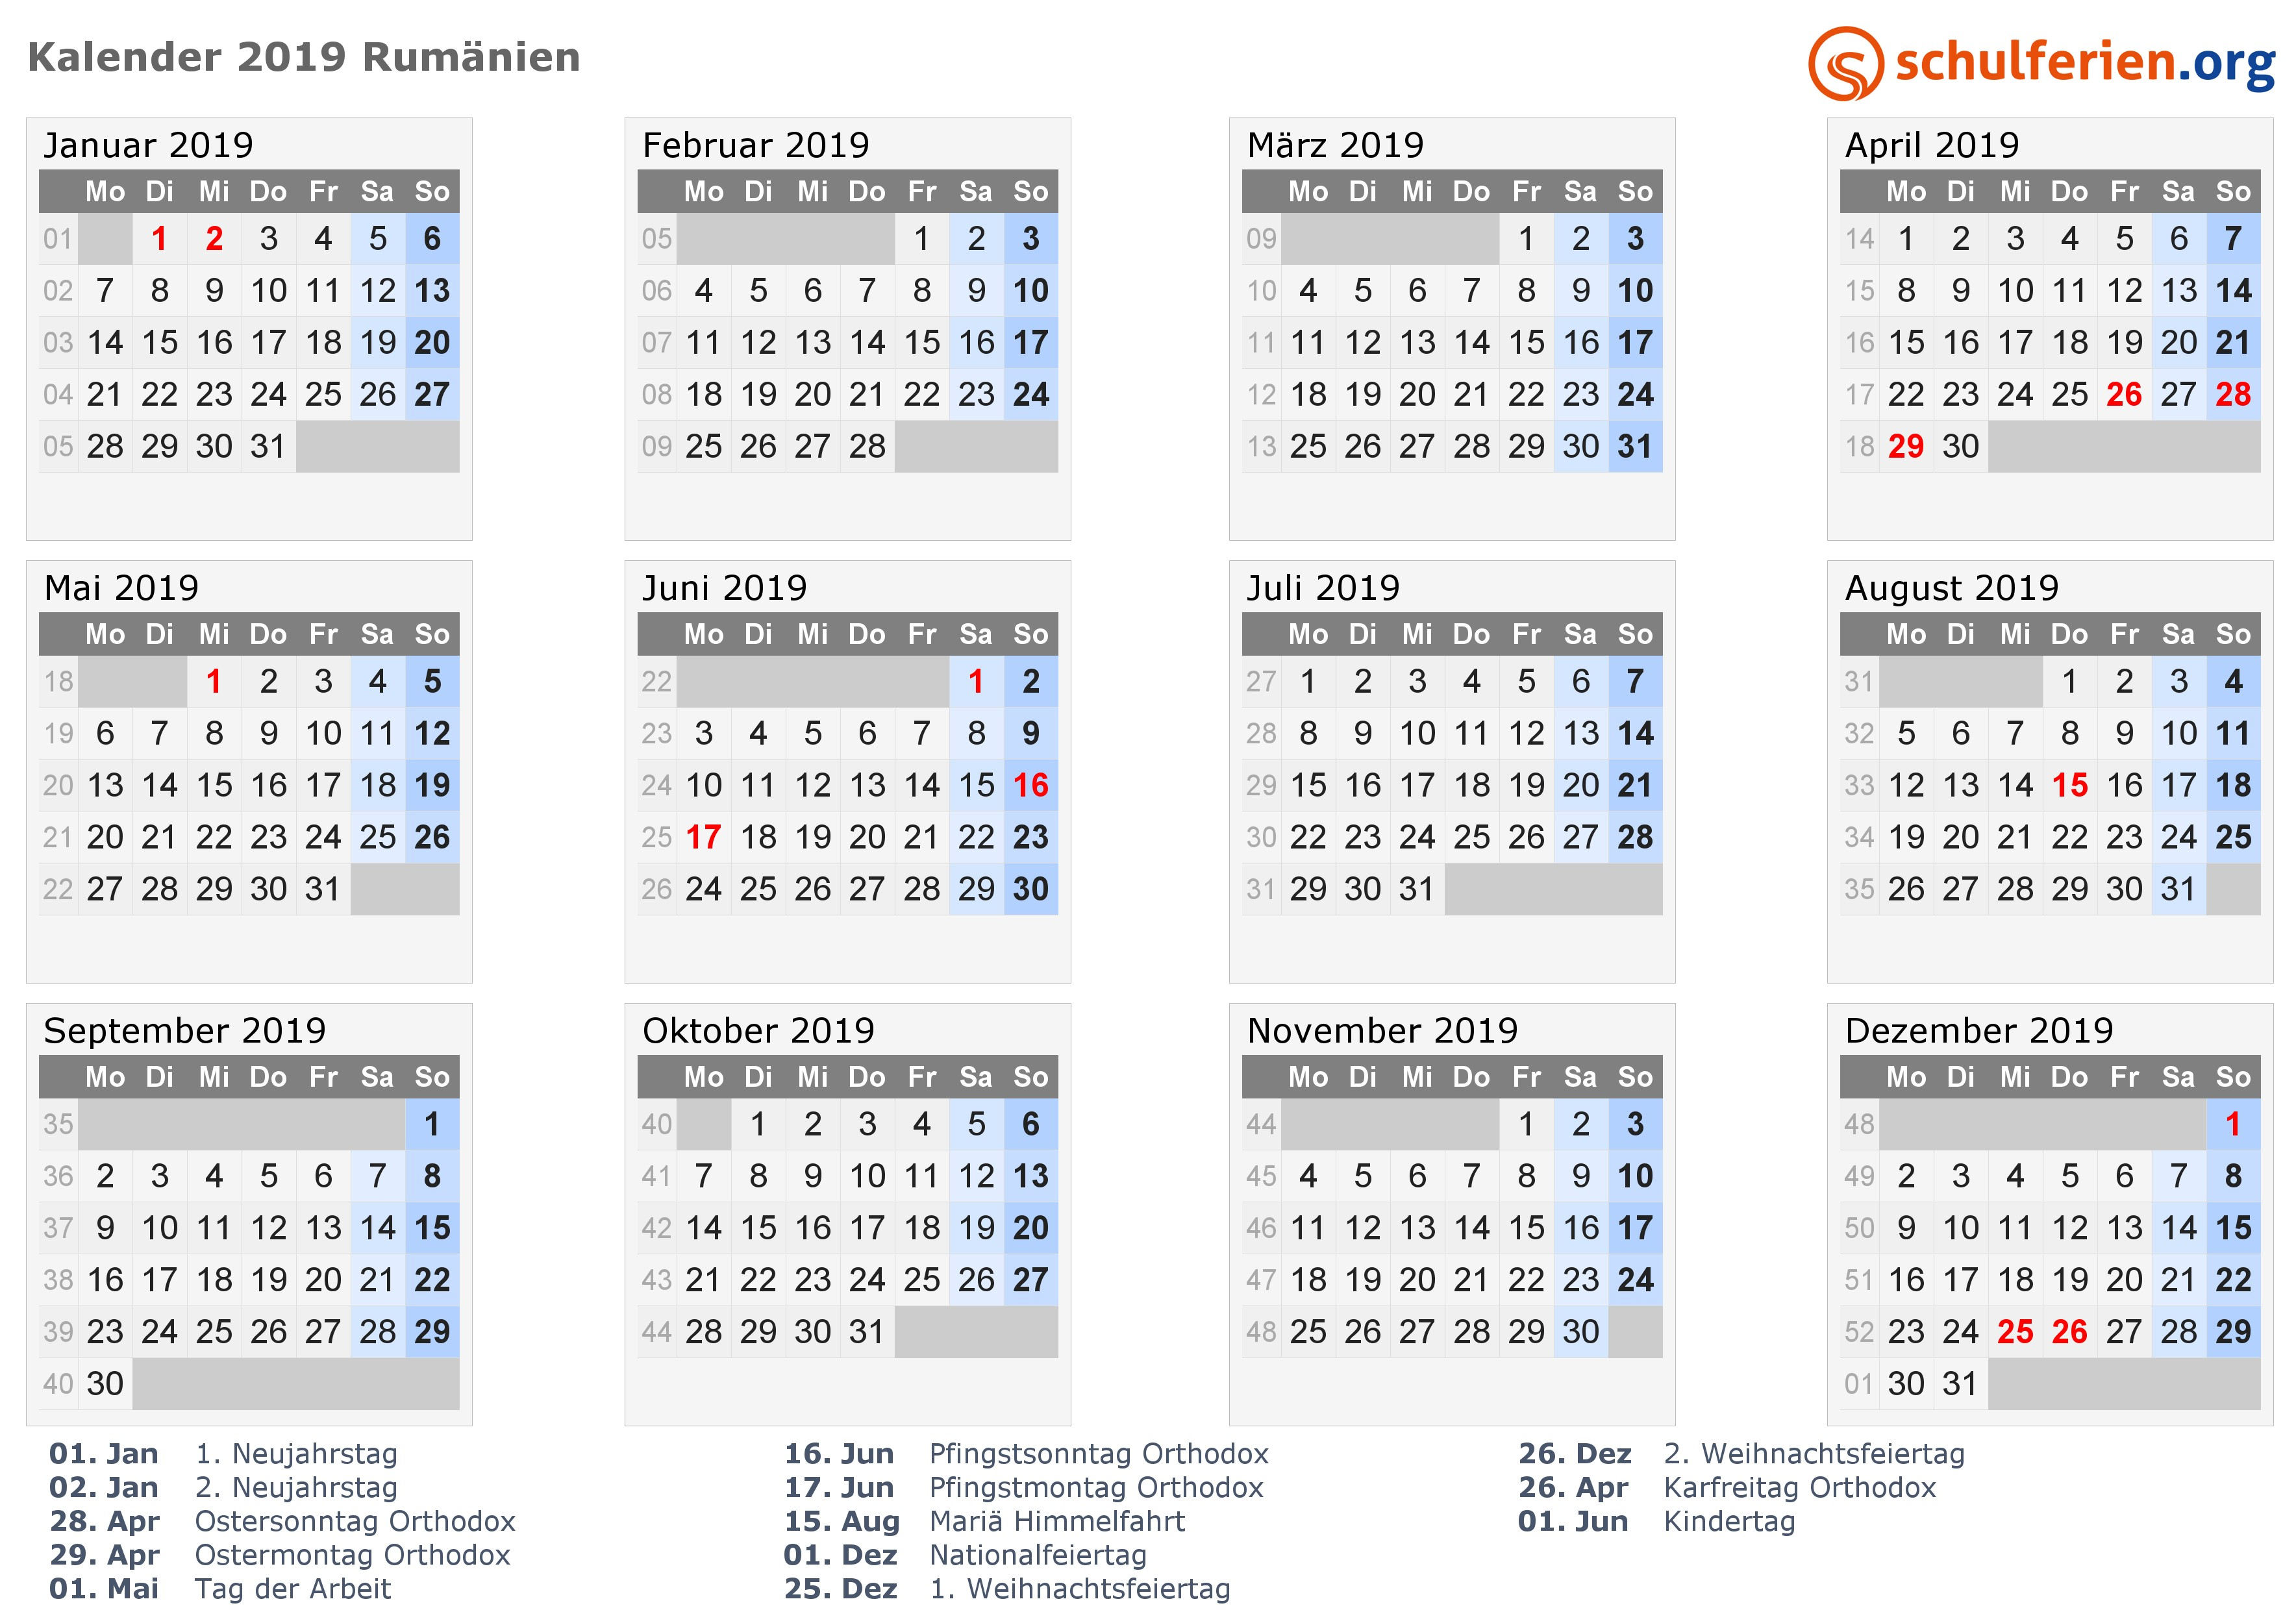 Download Kalender 2019 Pdf Lengkap Más Actual Kalender 2019 Infoagrarfuchss Webseite Vinpearl Baidaifo